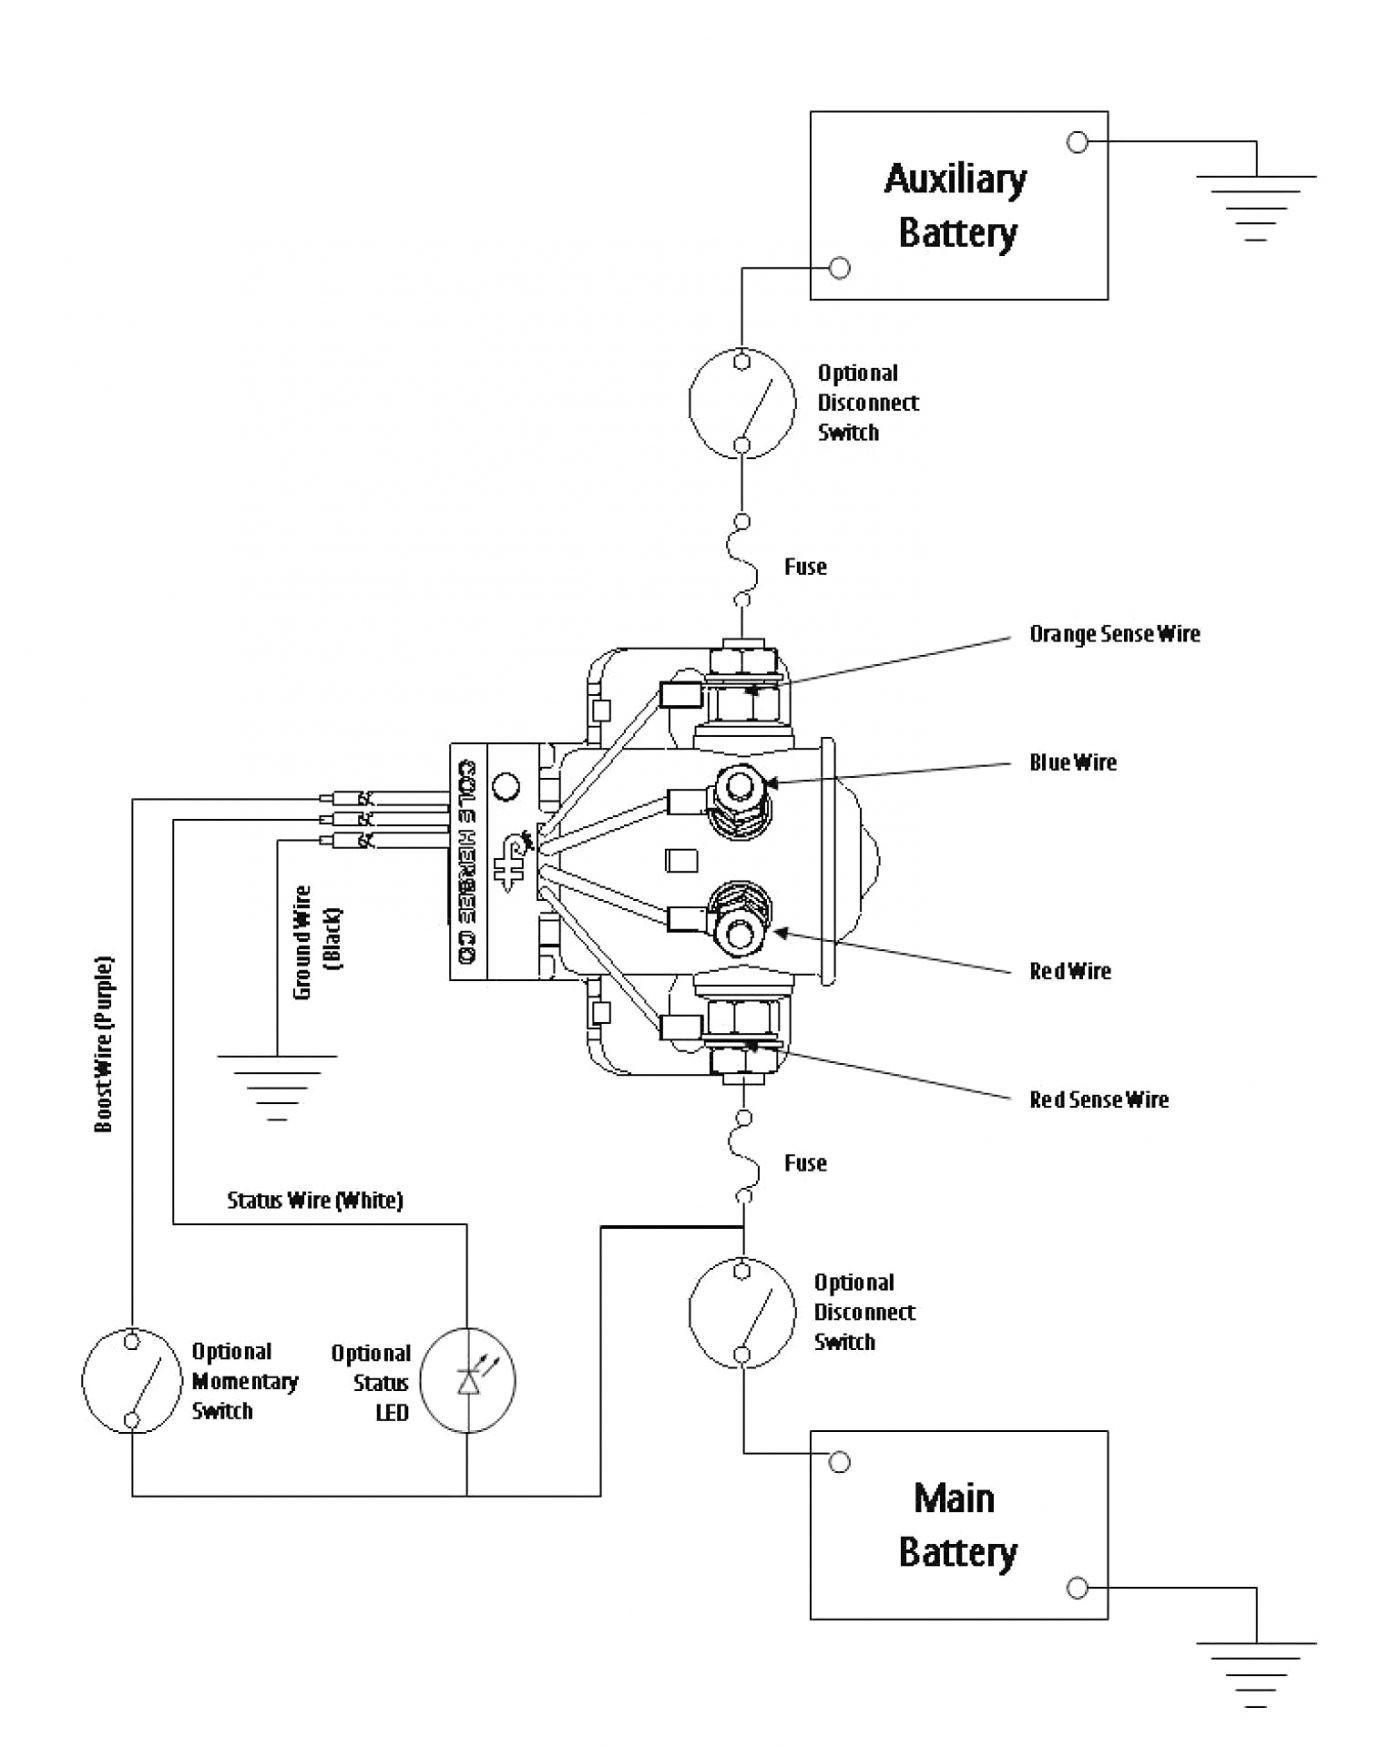 hight resolution of baldor 1 5 hp wiring diagram wiring diagram for mercury vapor light new baldor servo motor